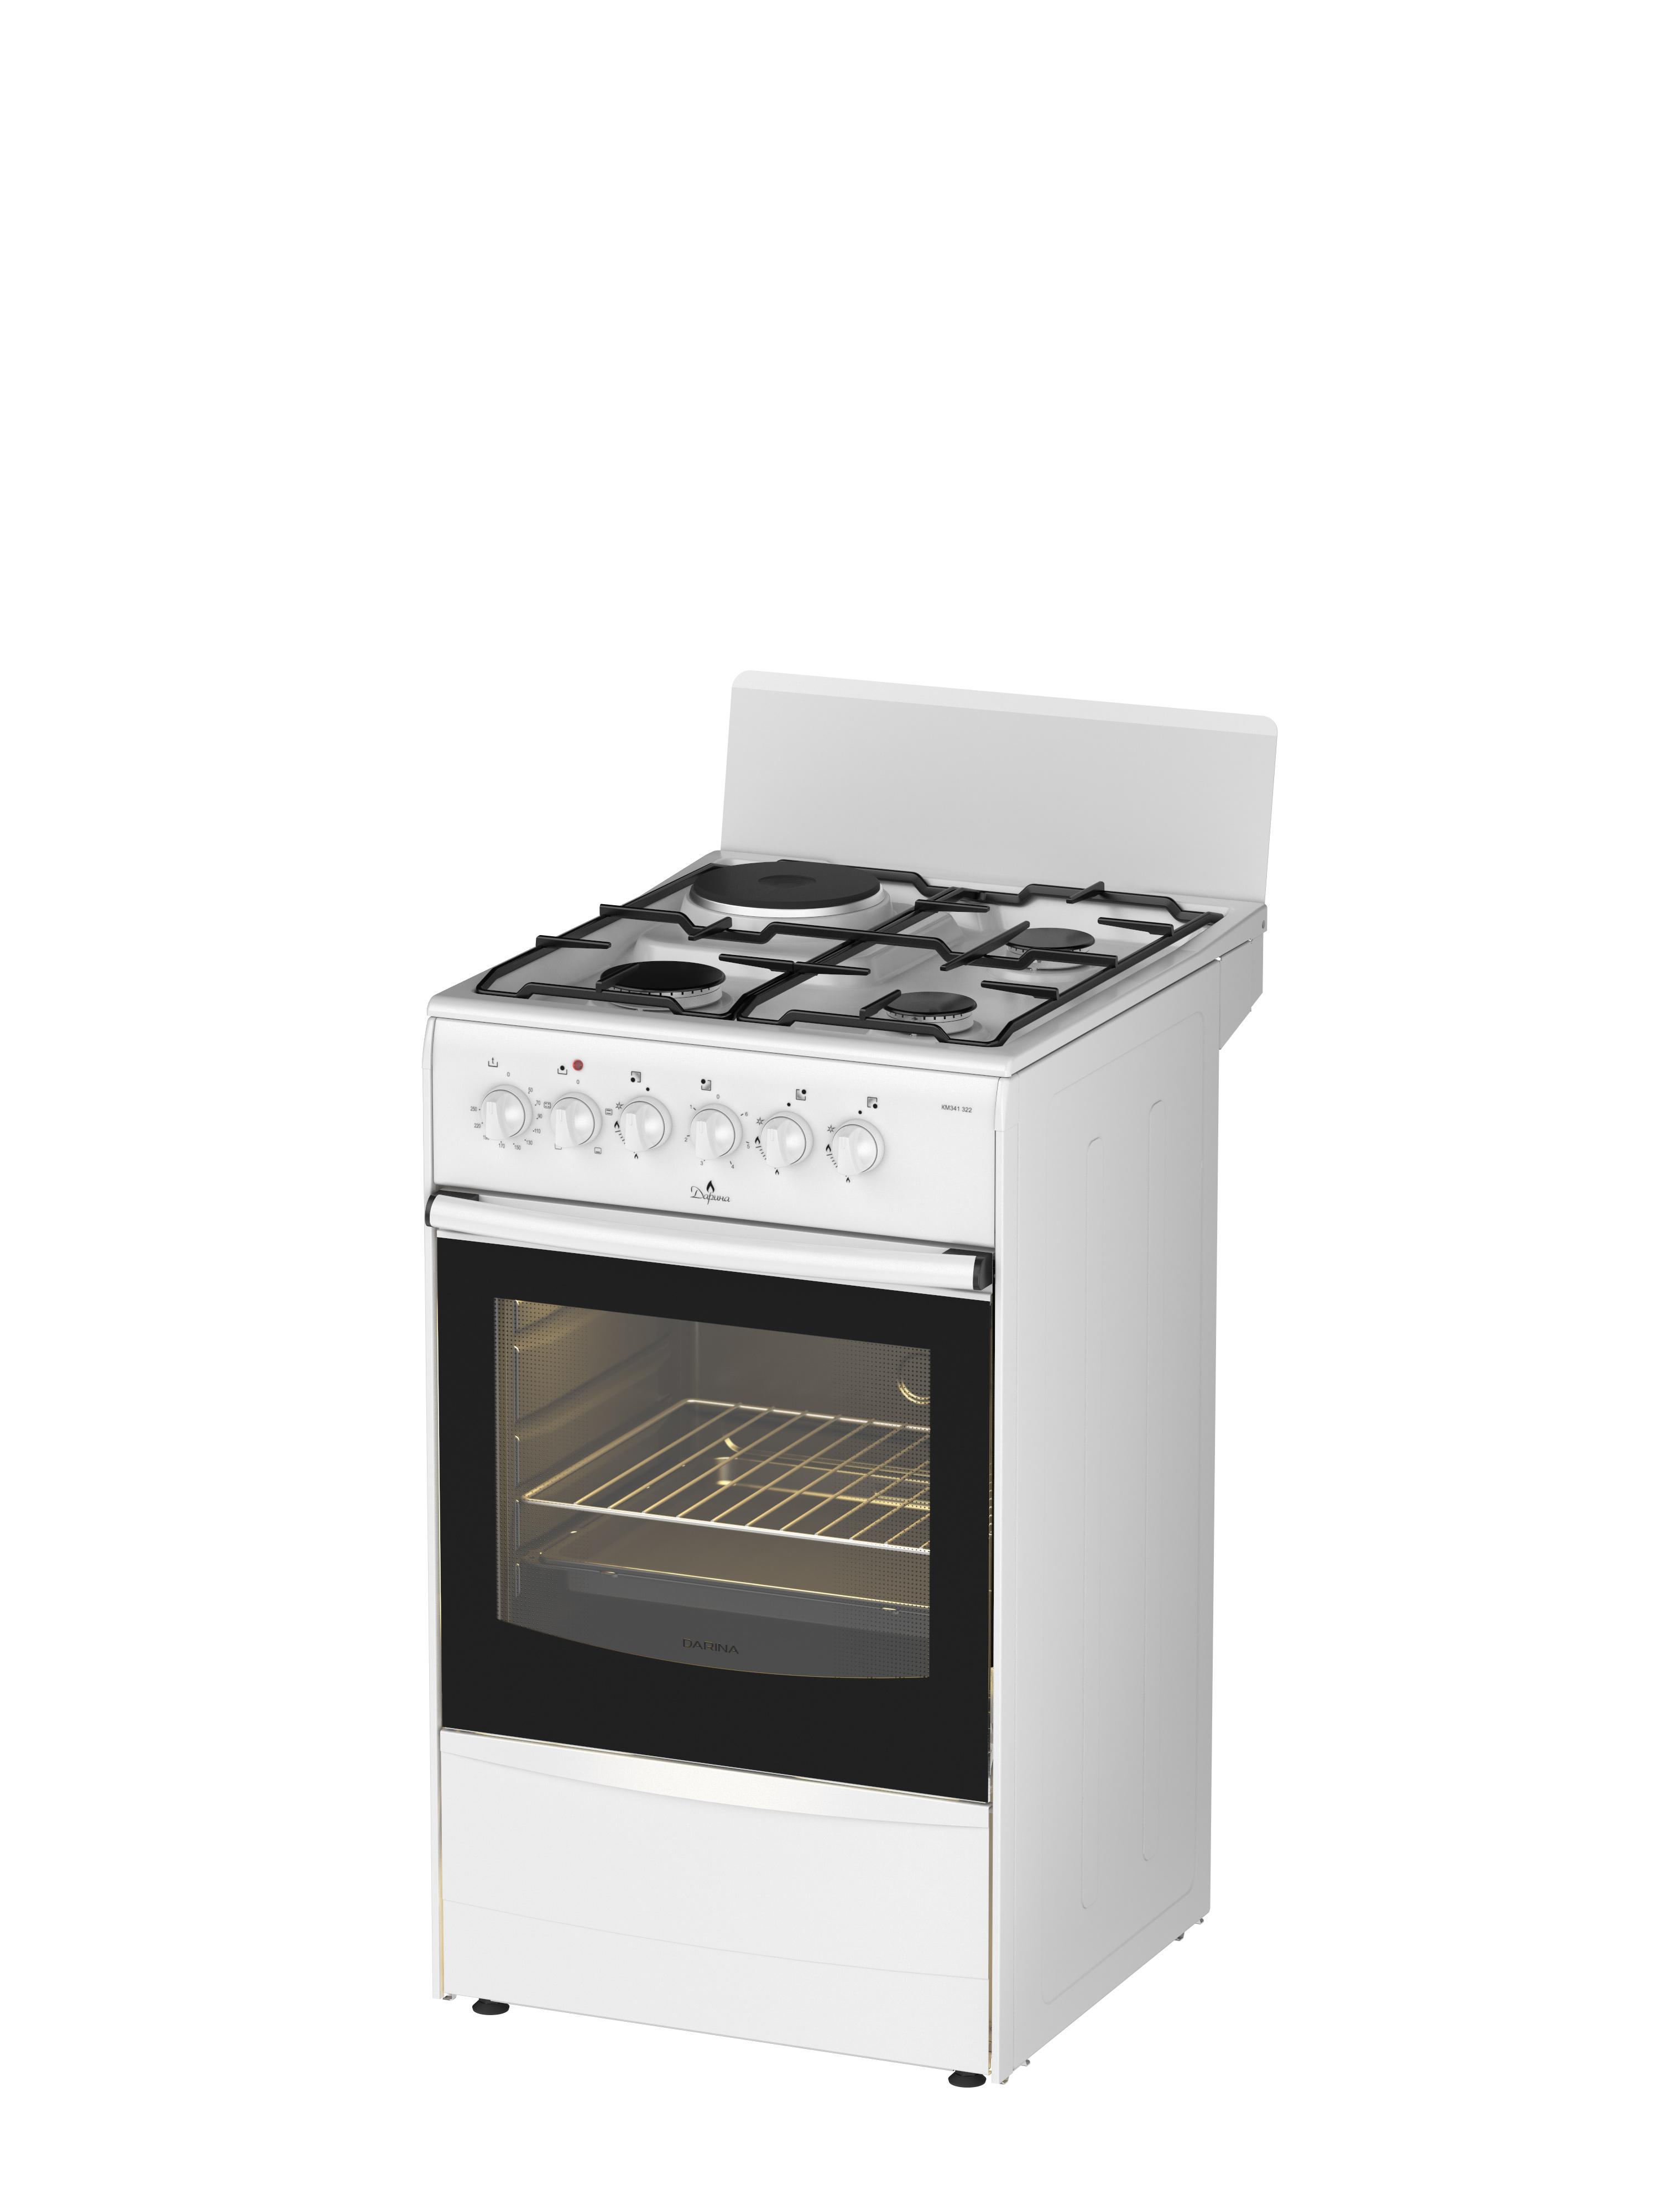 Darina 1A KM341 322 W, White плита комбинированная комбинированная плита deluxe 506031 01 гэ крышка